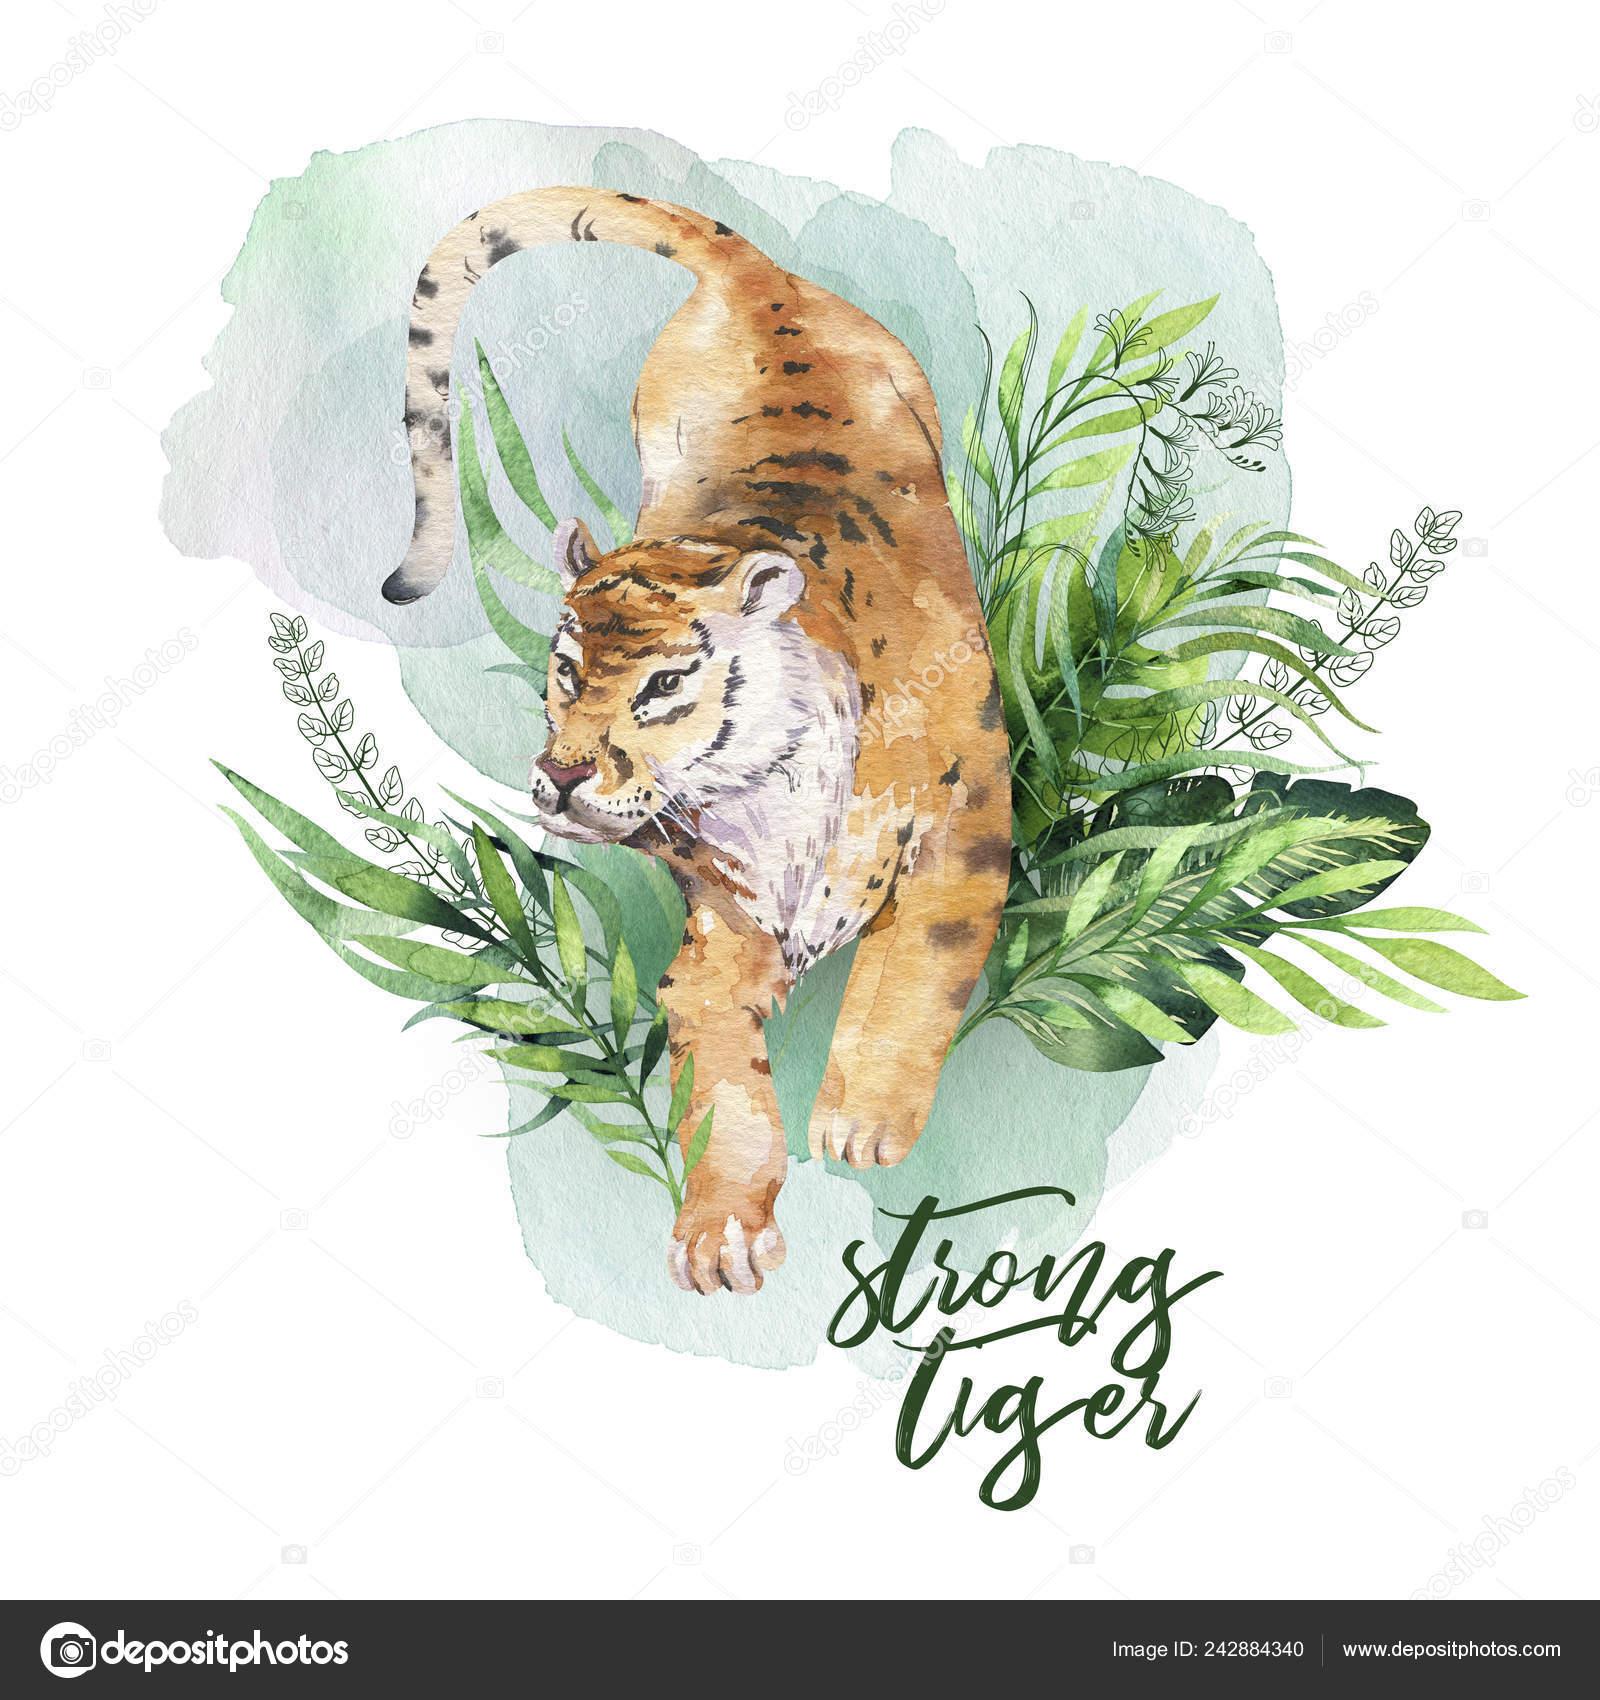 Aquarell Tiger Illustration Und Sommer Paradies Tropische Blätter